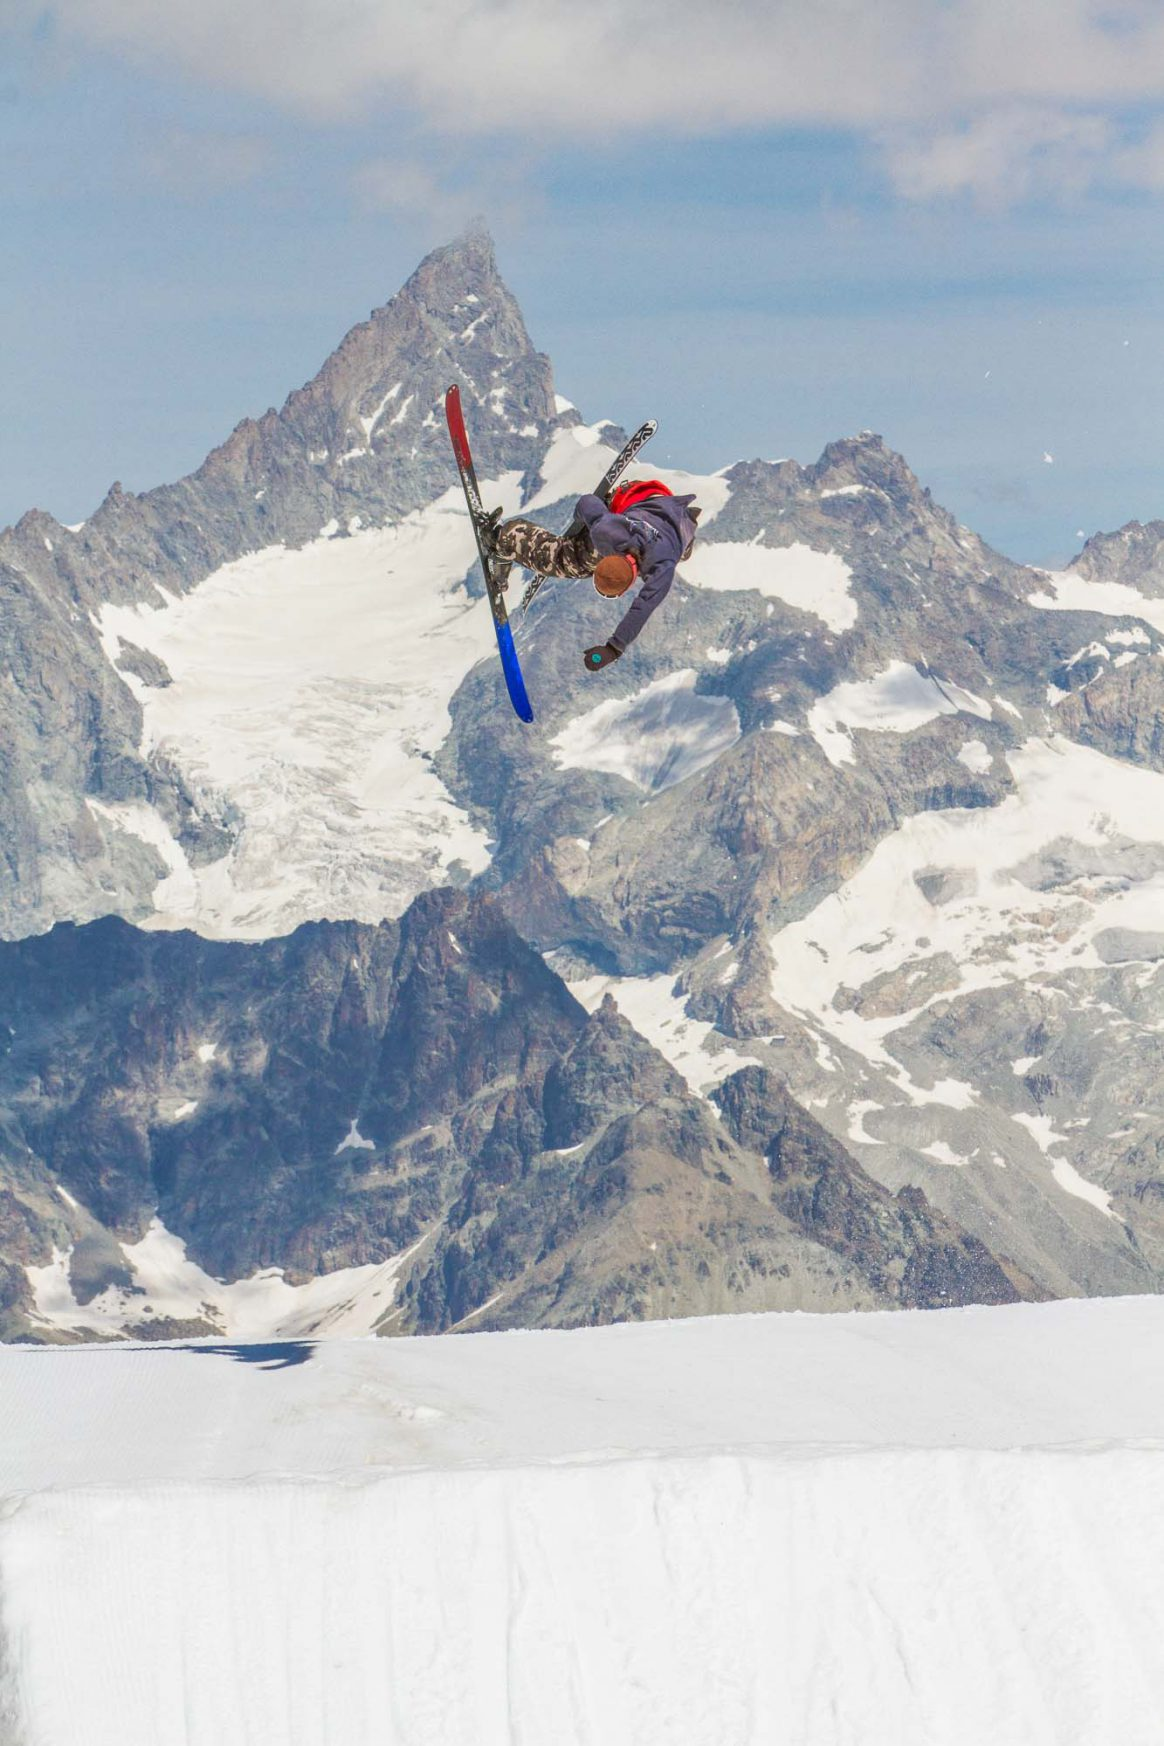 Kai Mahler, cork 360 japan, zermatt snowpark, ethan stone, downdays